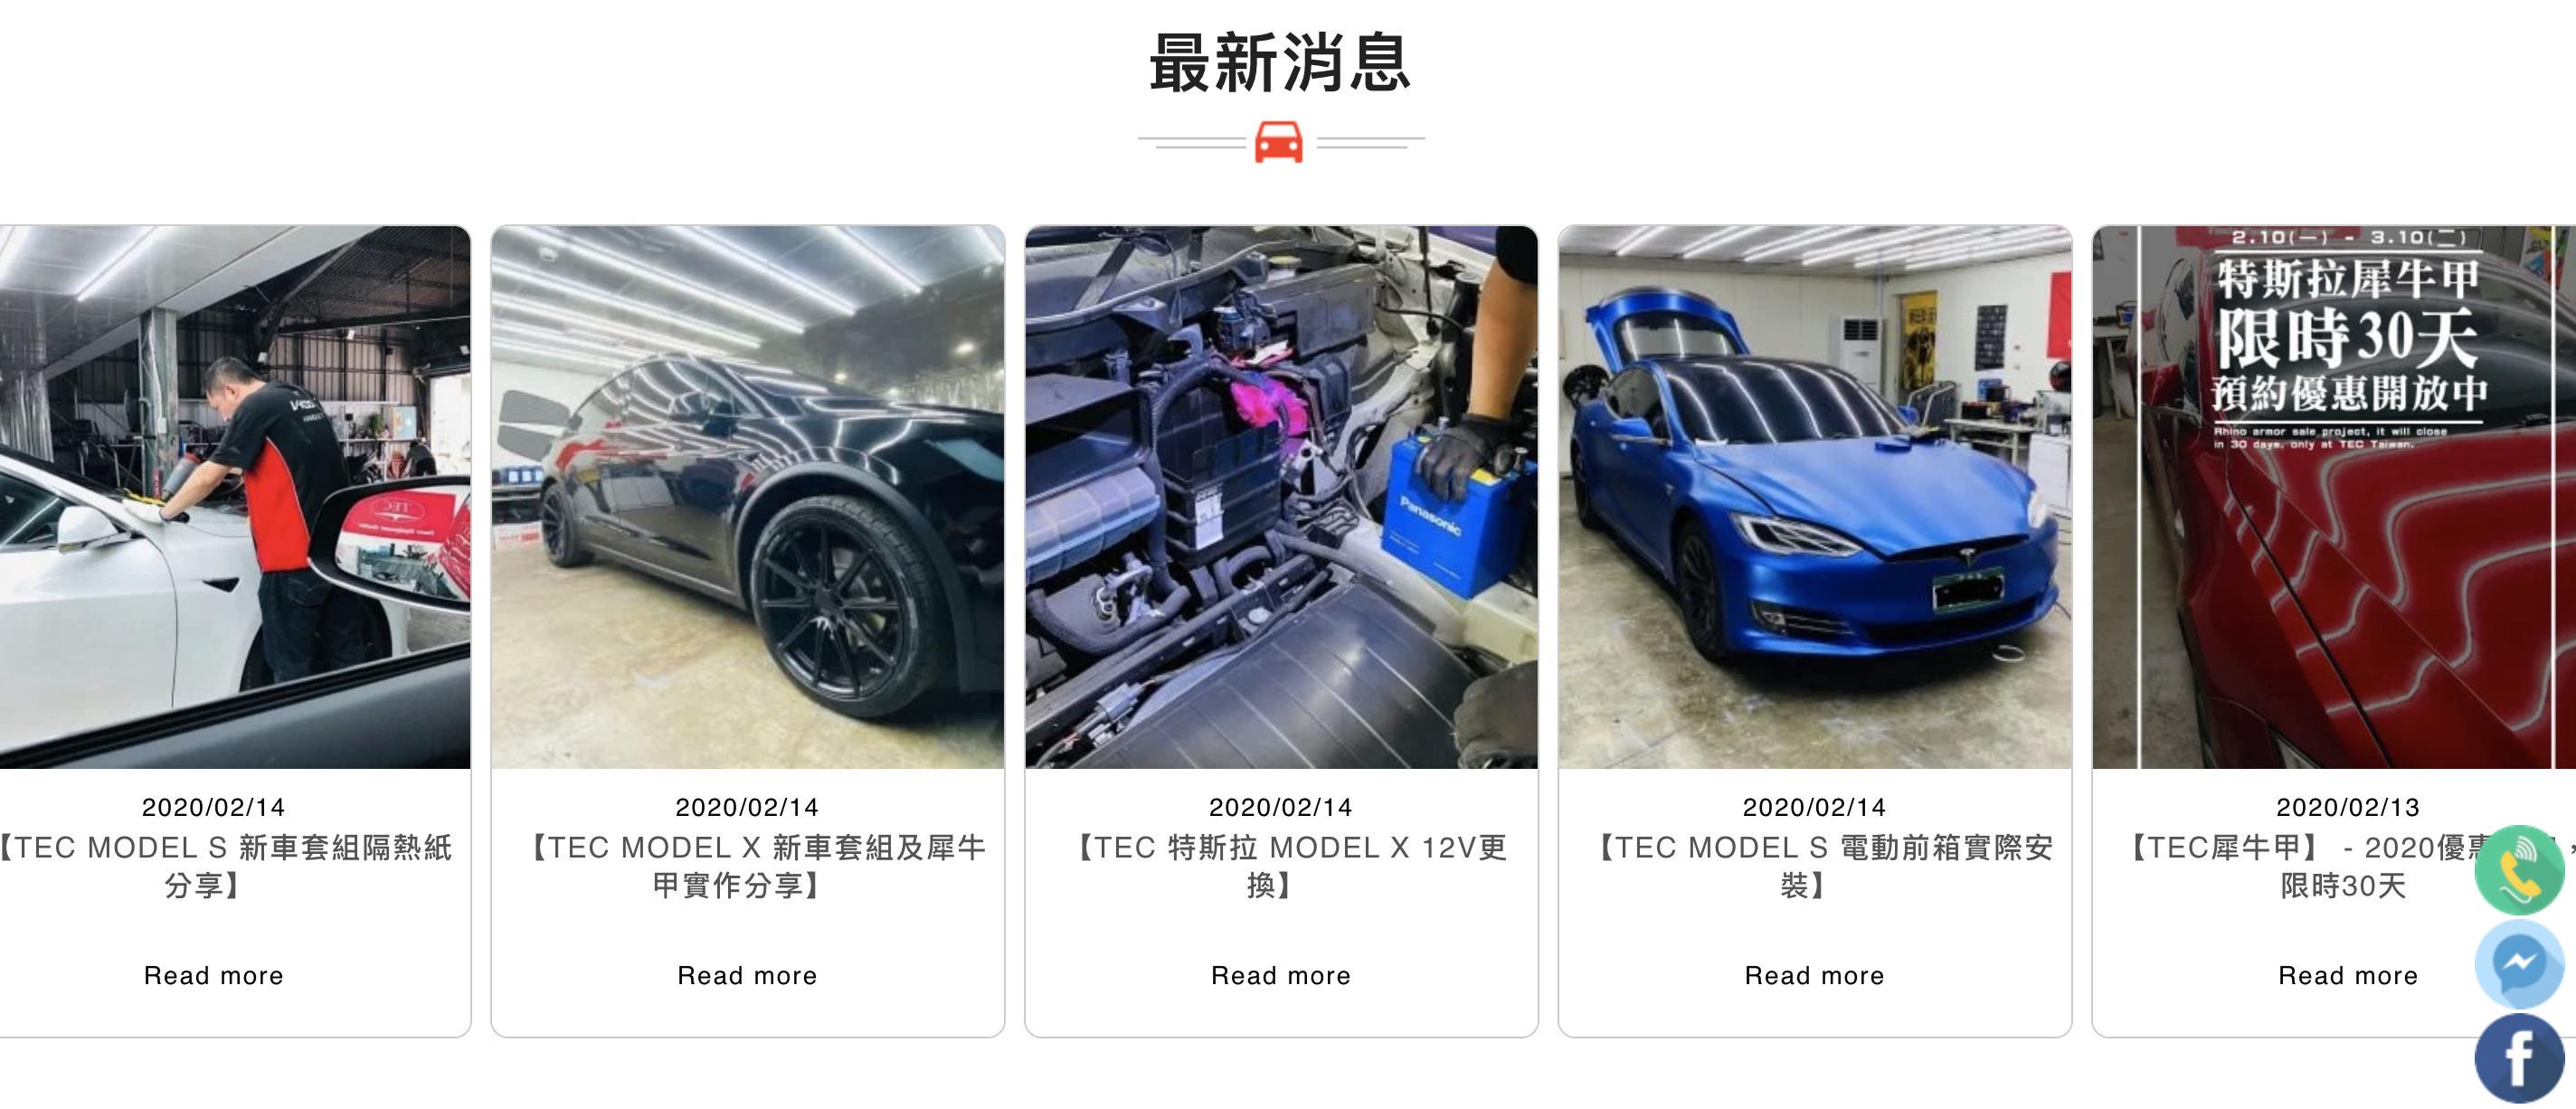 TEC-TESLA EQUIPMENT CENTER 台灣電動車保養改裝廠